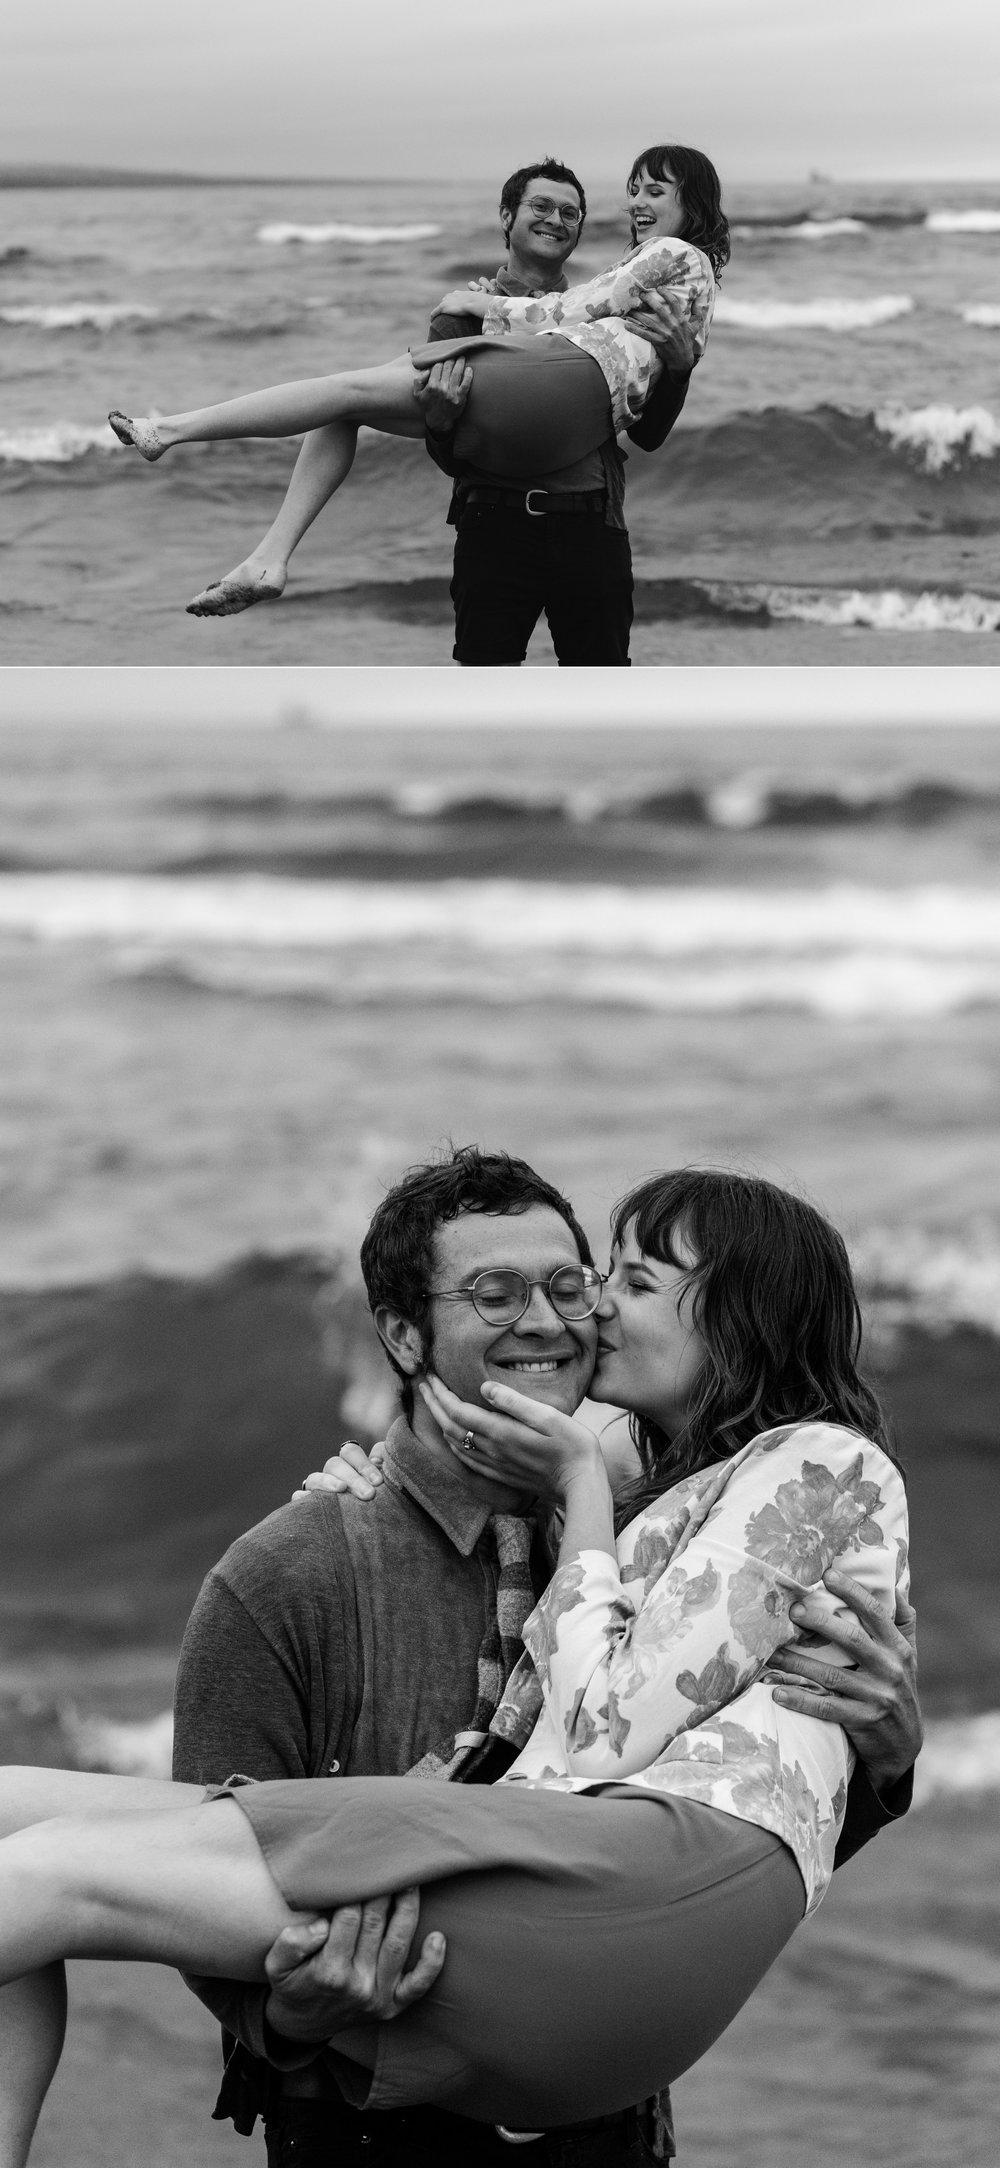 mandy aaron engagement minneapolis minnesota texas austin wedding elopement destination intimate best photographer_0160.jpg